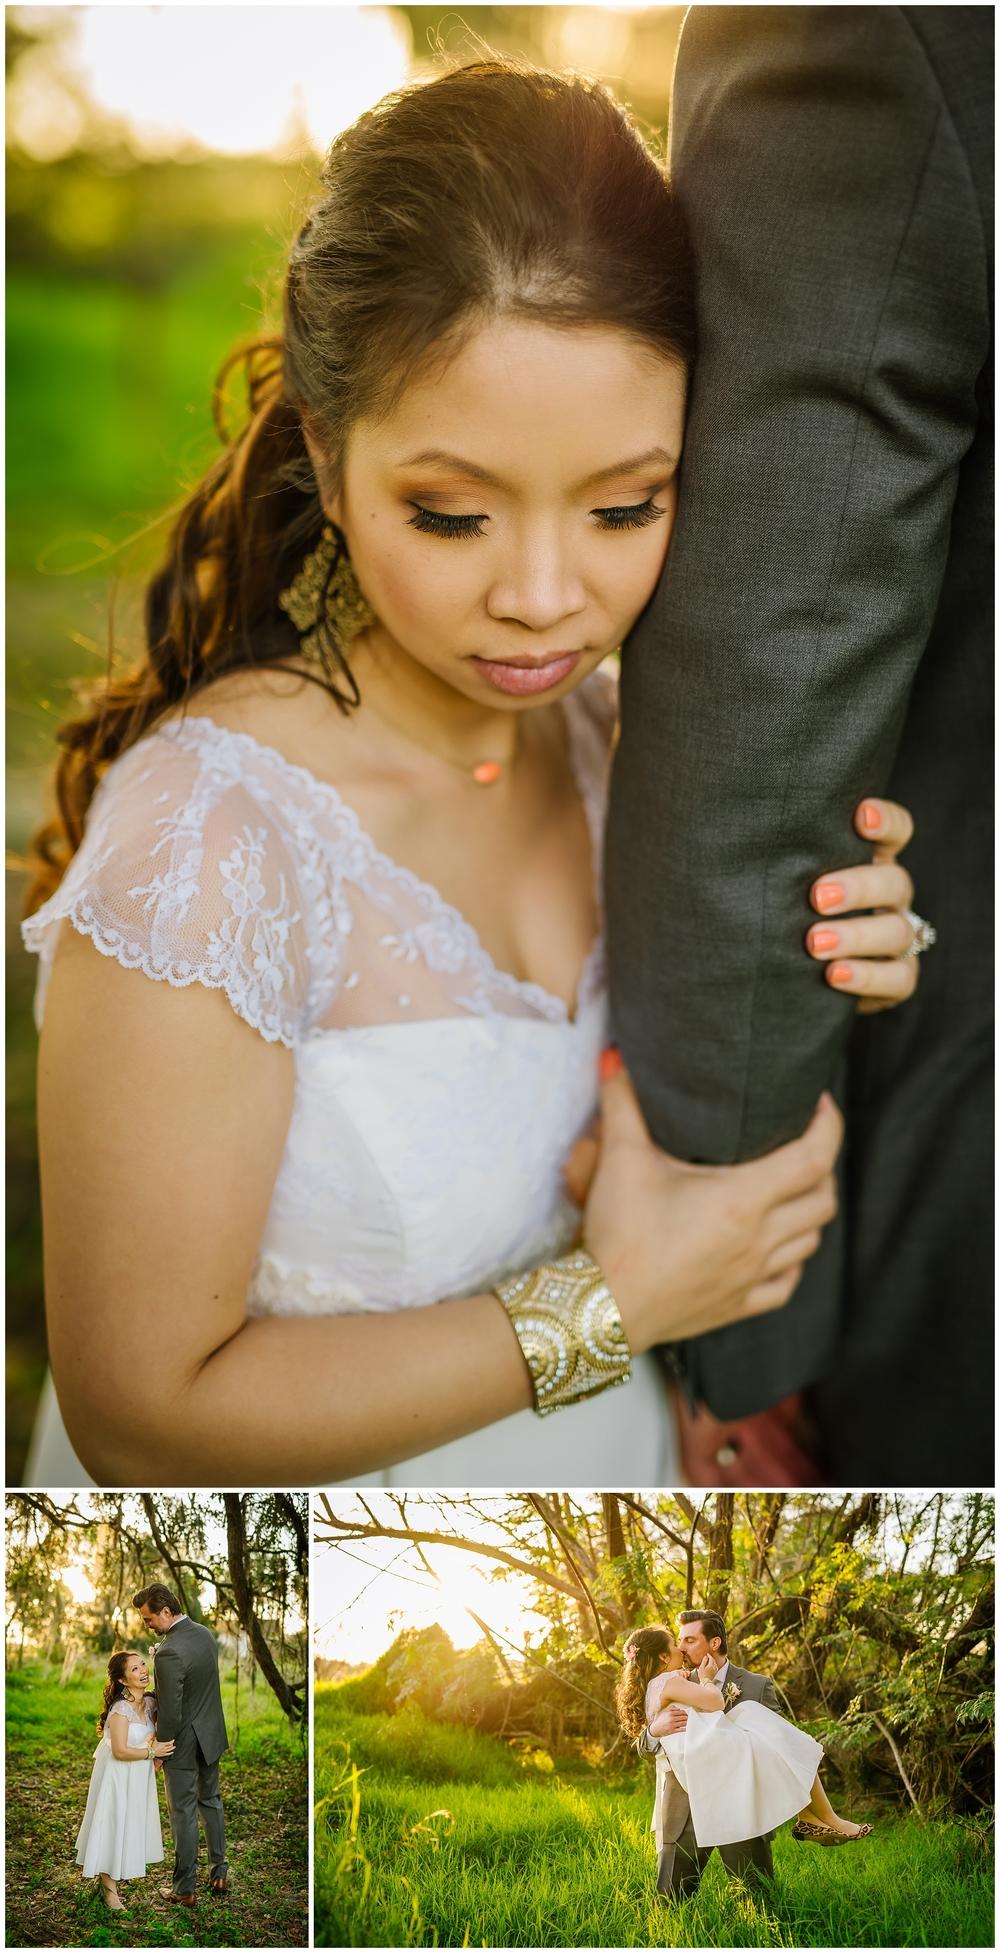 tampa-wedding-photographer-winthrop-barn-ivy-wall-portraits_0176.jpg